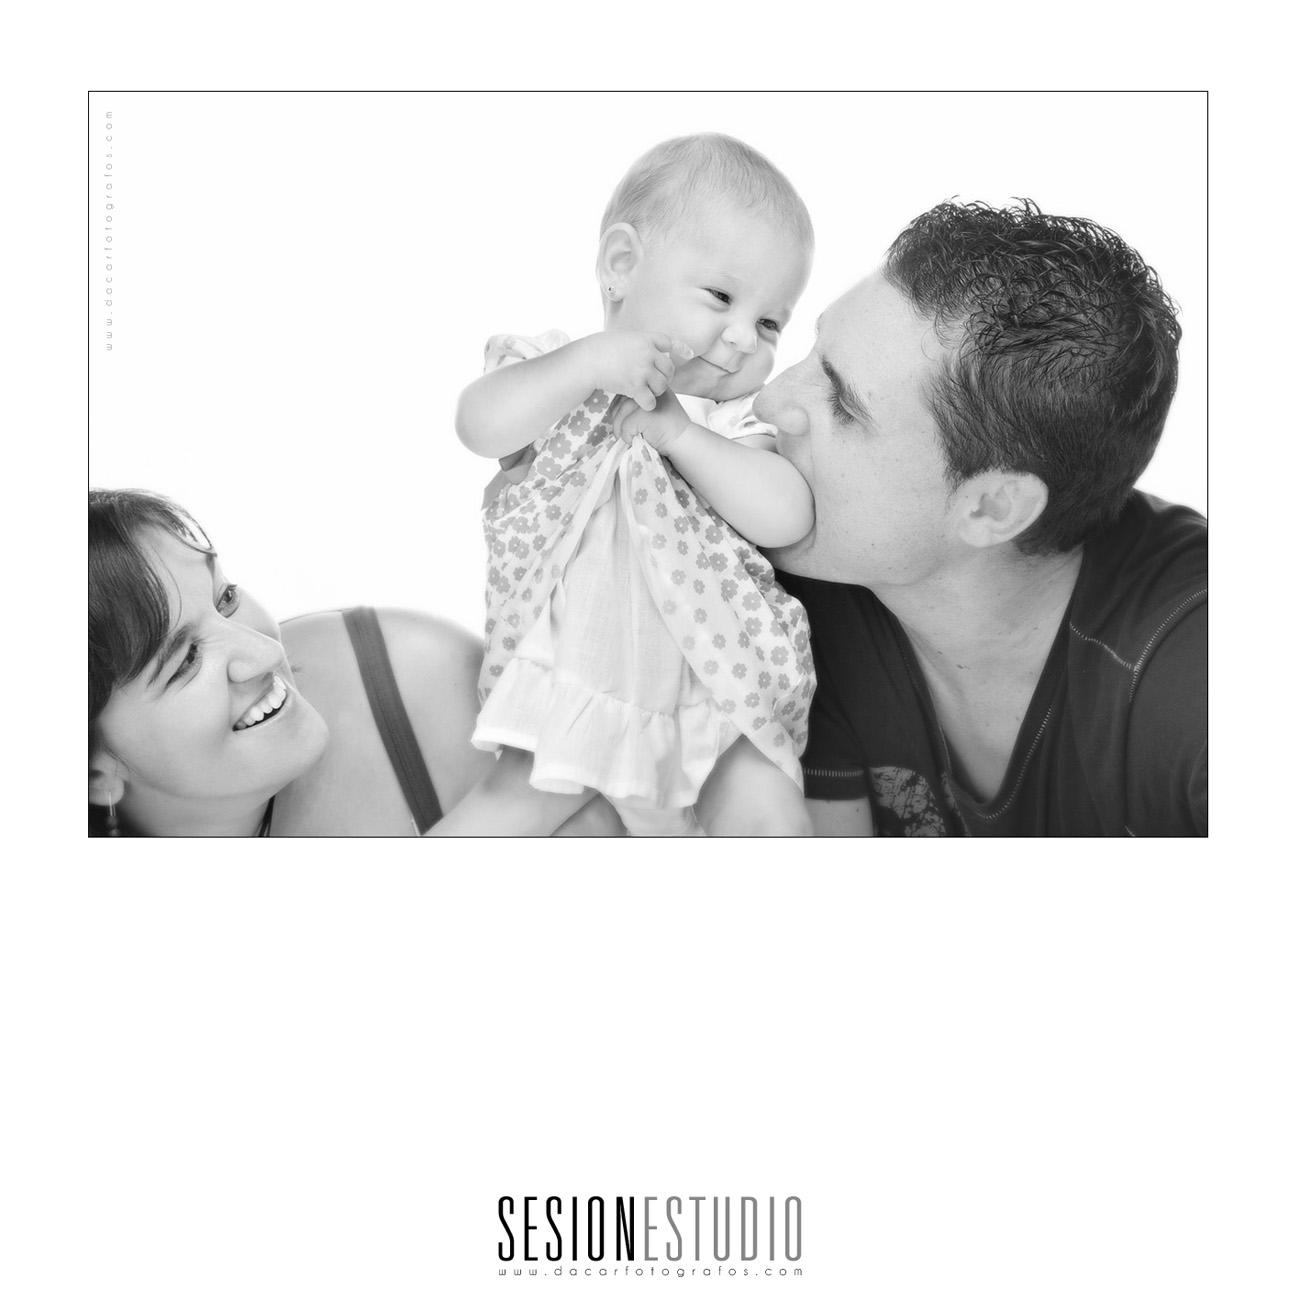 fotografo-villaviciosa-asturias-madrid-sesion-fotografica-seguimiento-infantil-niños-profesional